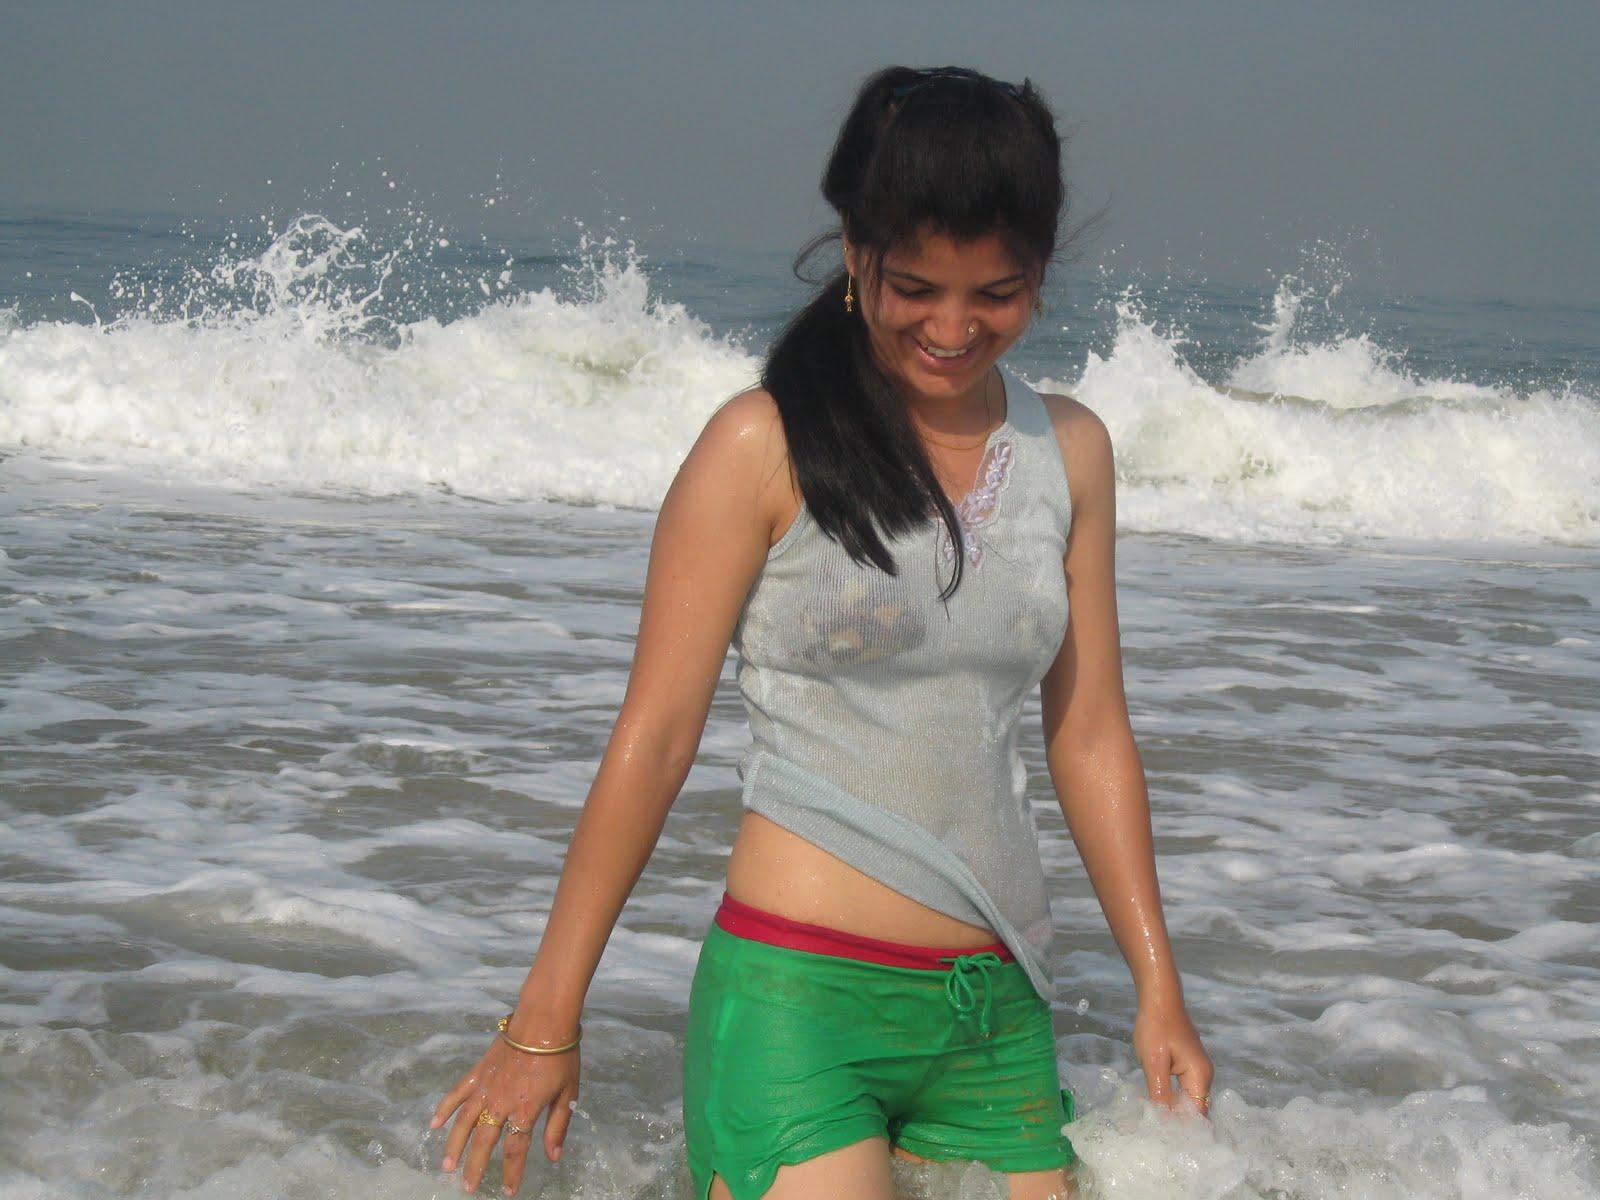 Choti girl nude photos - Nude photos